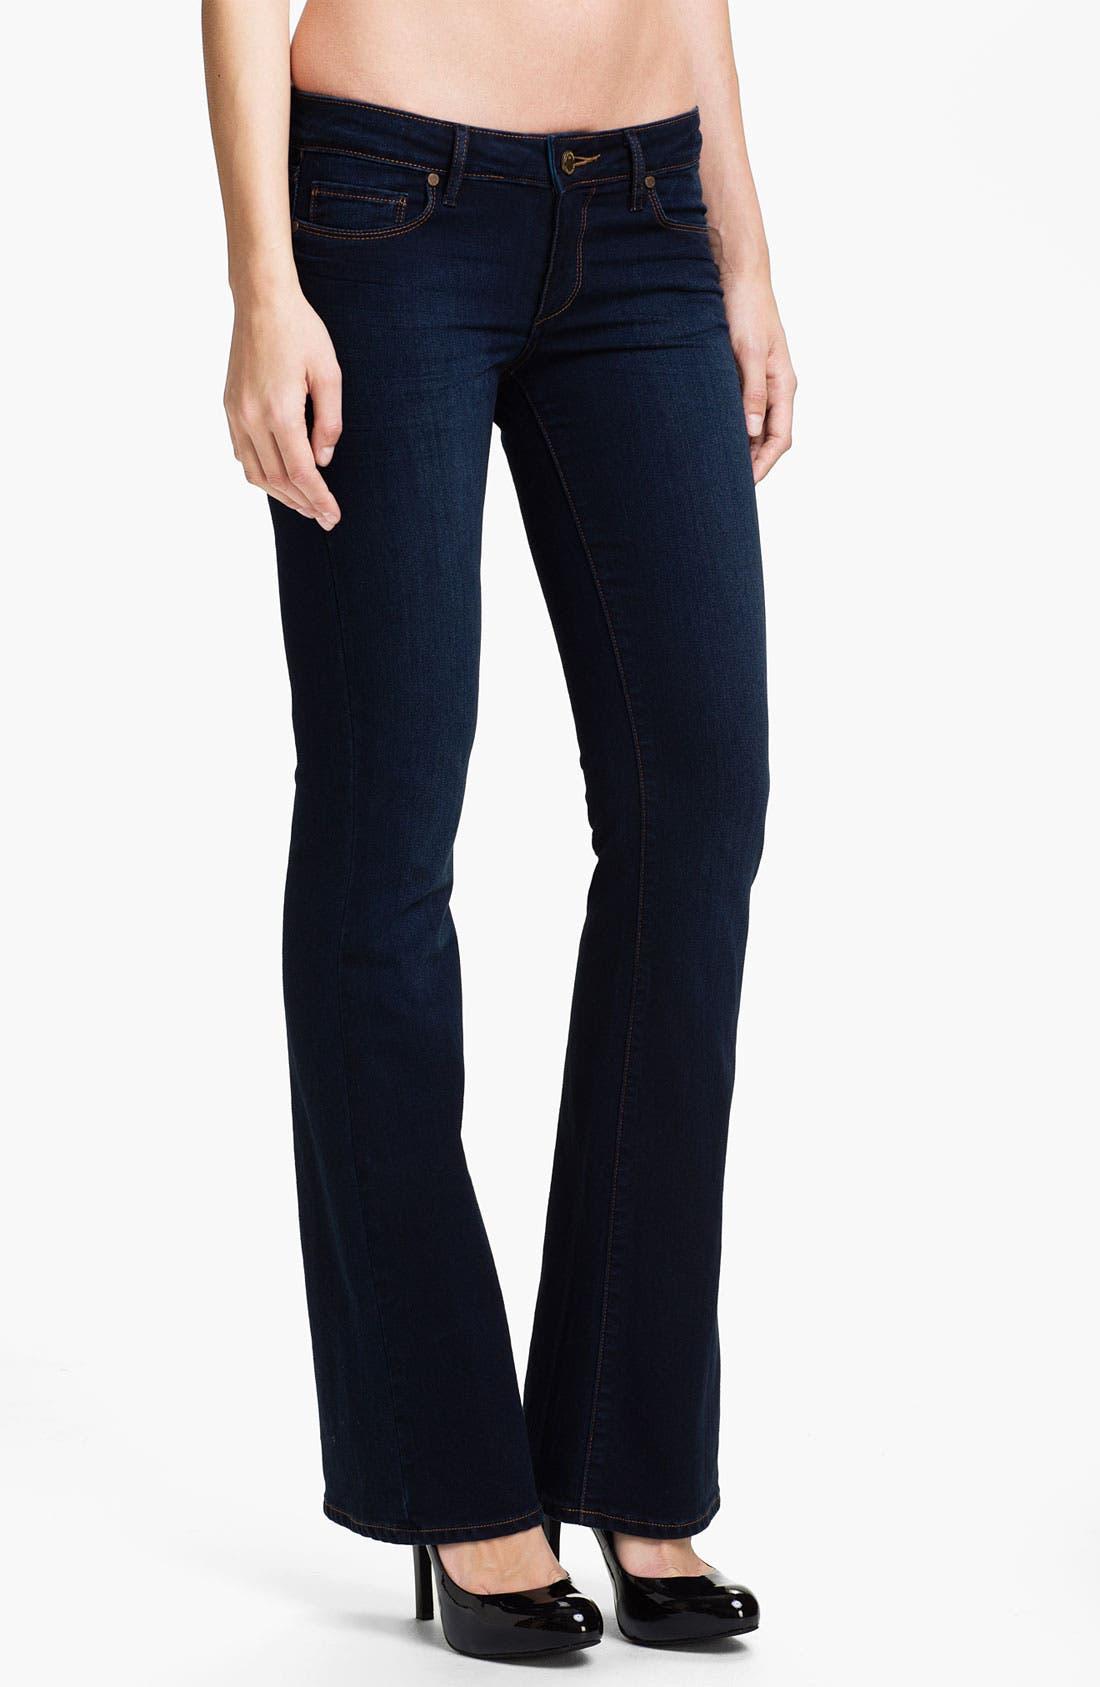 Main Image - Paige Denim 'Skyline' Bootcut Jeans (Lynx)